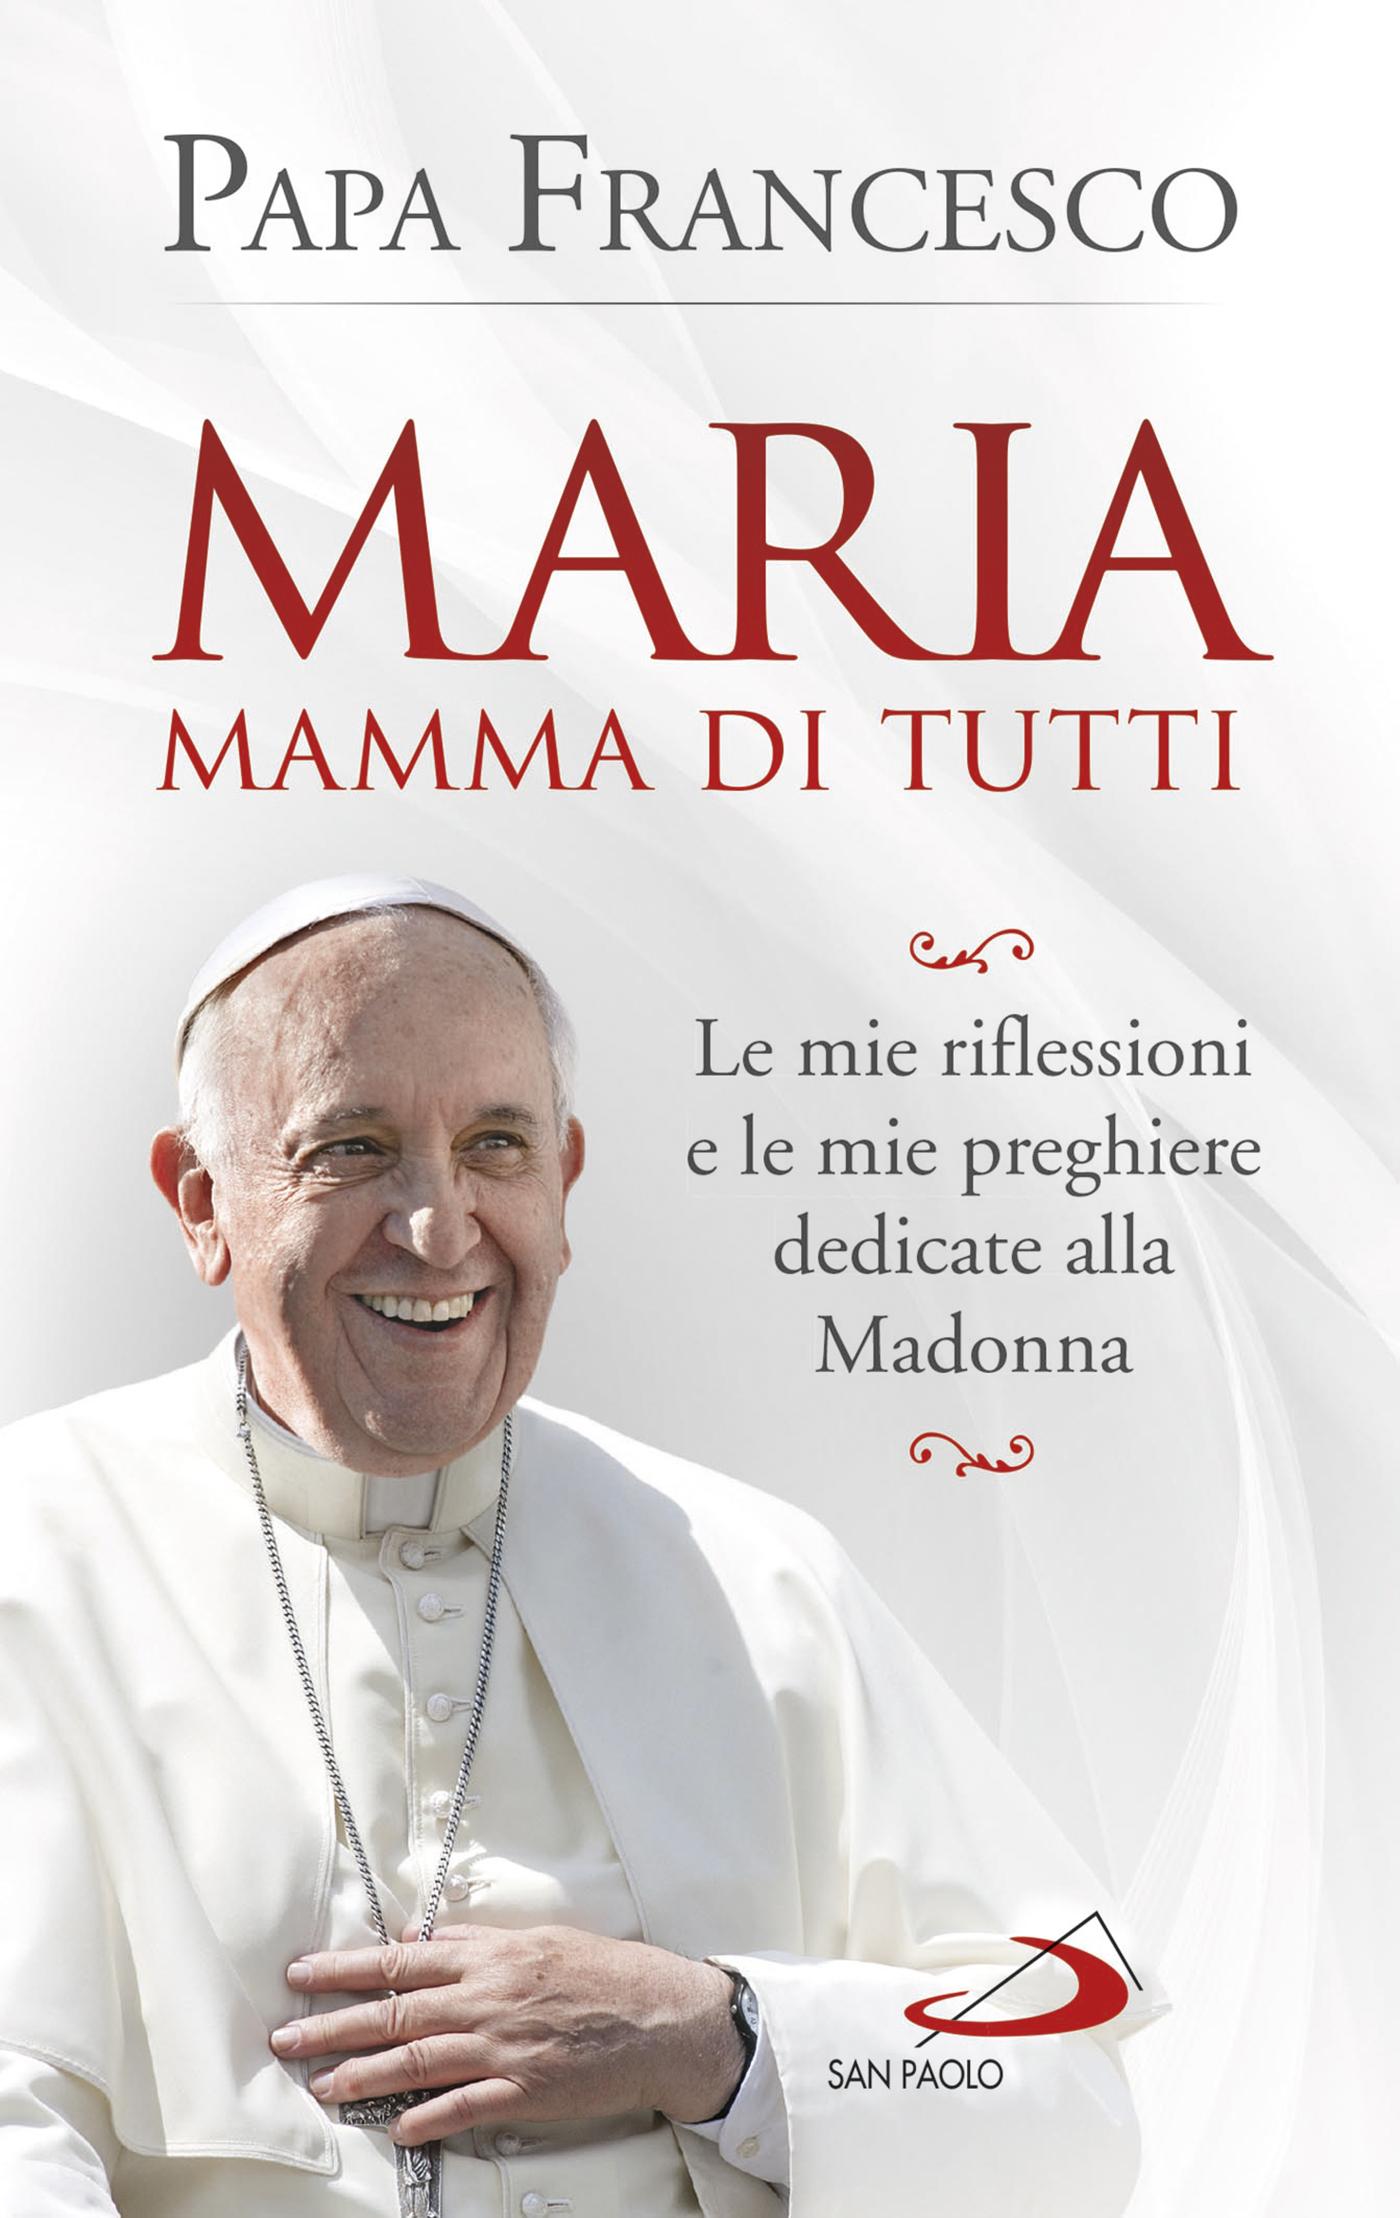 Maria mamma di tutti Papa Francesco